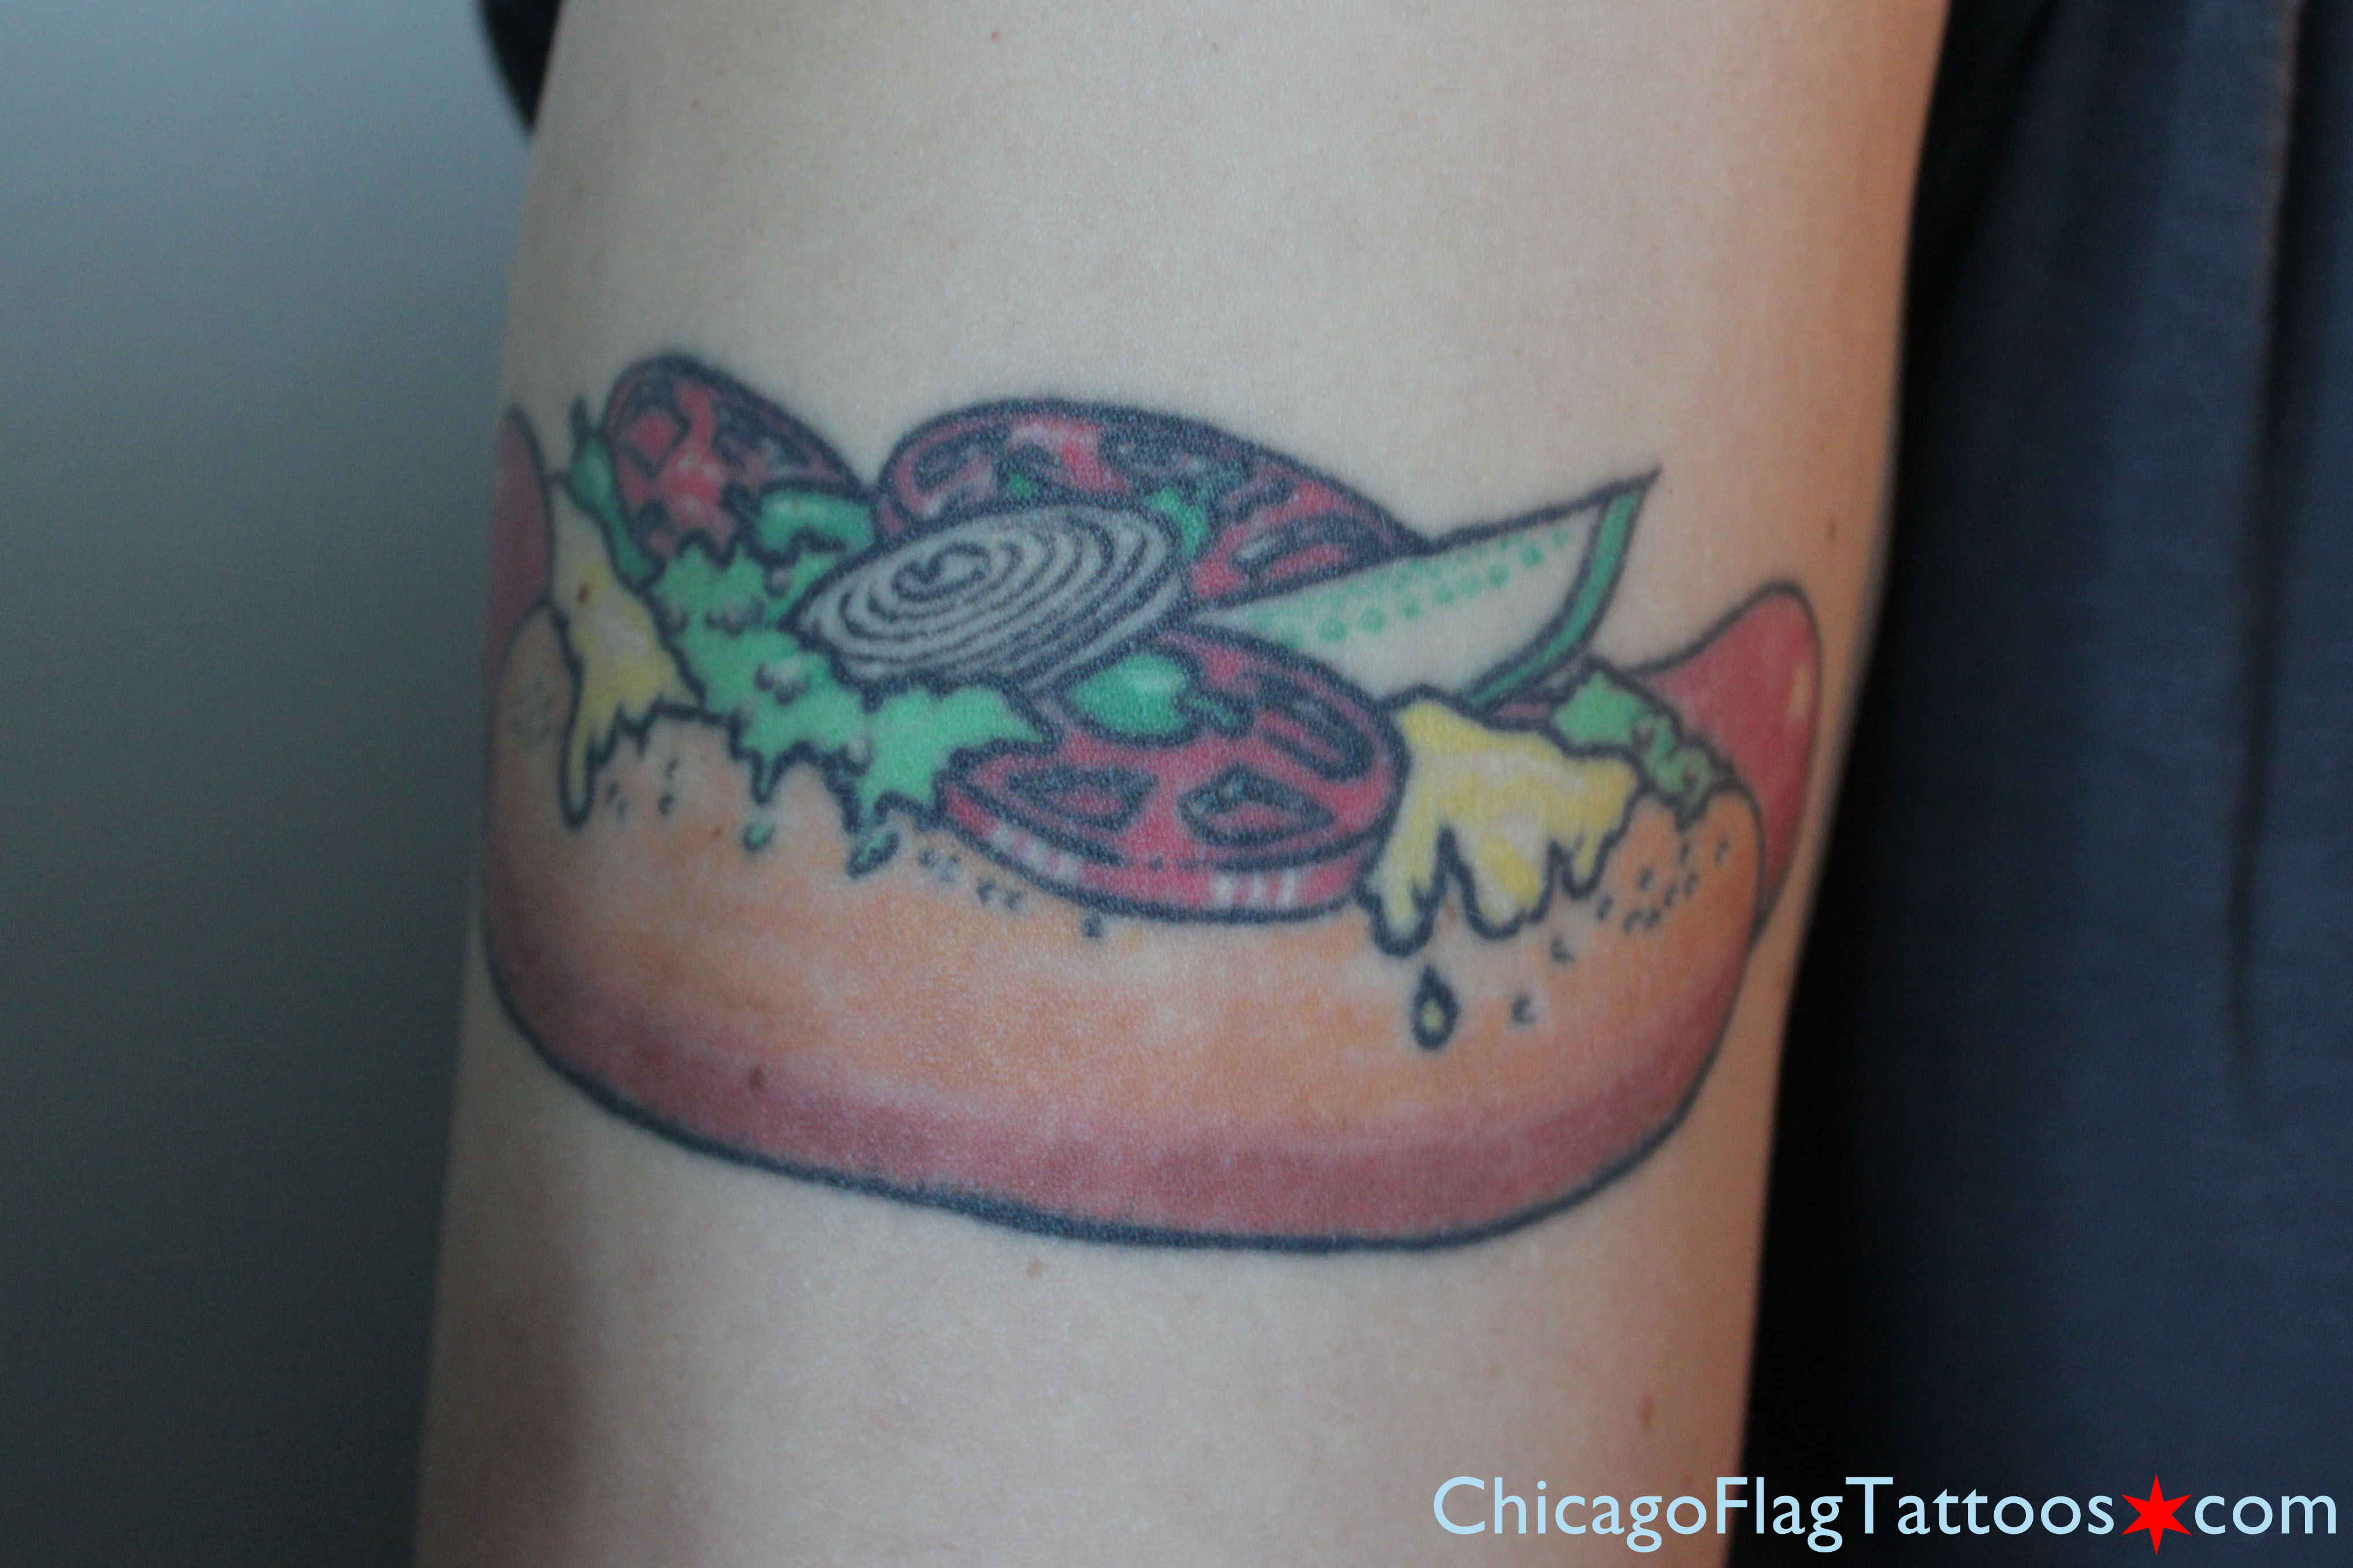 http://chicagoflagtattoos.com/img/zoelle_fishman_chicago_hotdog_tattoo.jpg